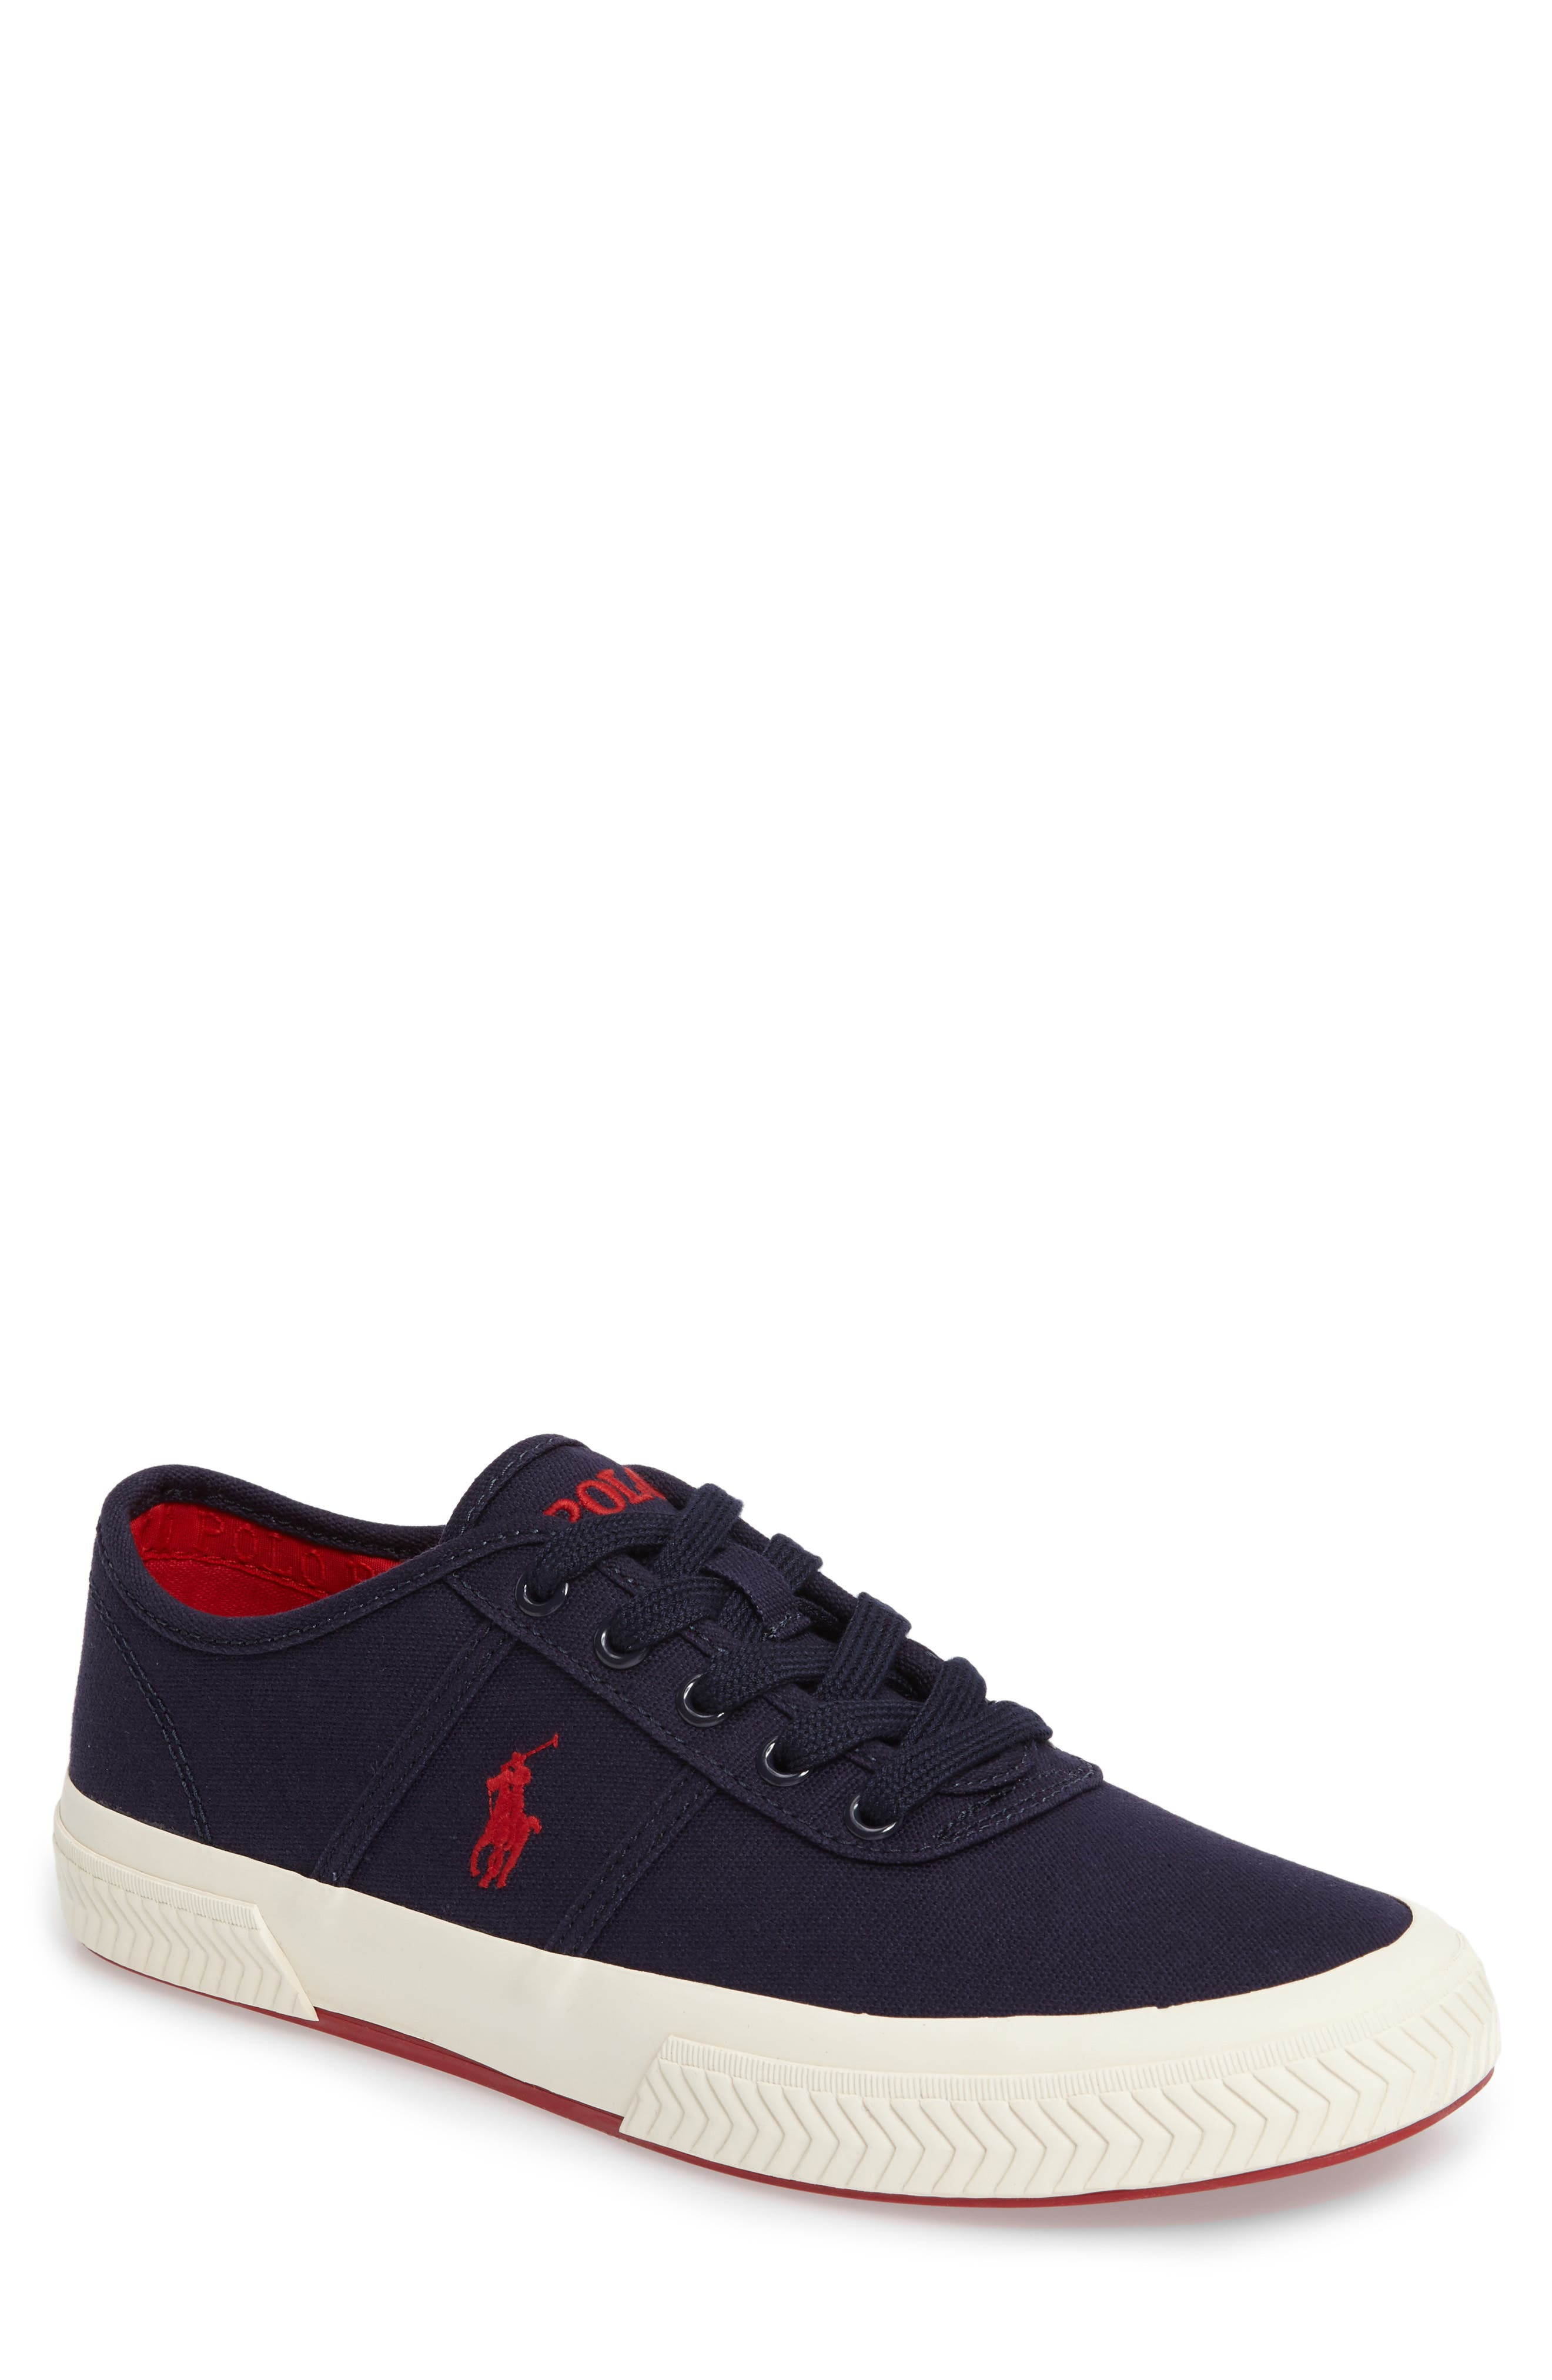 Polo Ralph Lauren Tyrian Sneaker,                             Main thumbnail 1, color,                             410